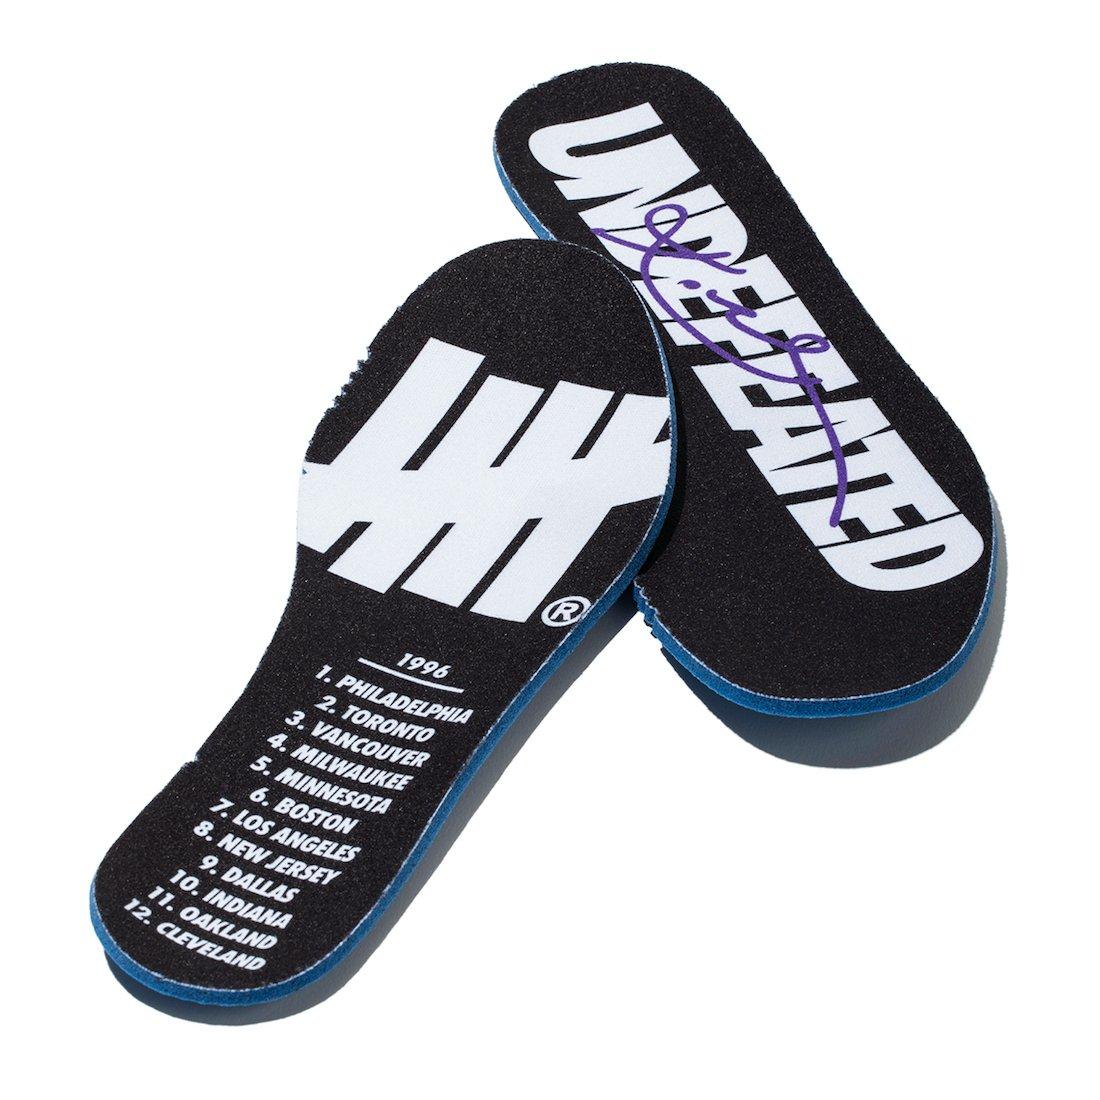 Undefeated Nike Kobe 5 Protro Doubel Digits CZ6499-900 Release Info